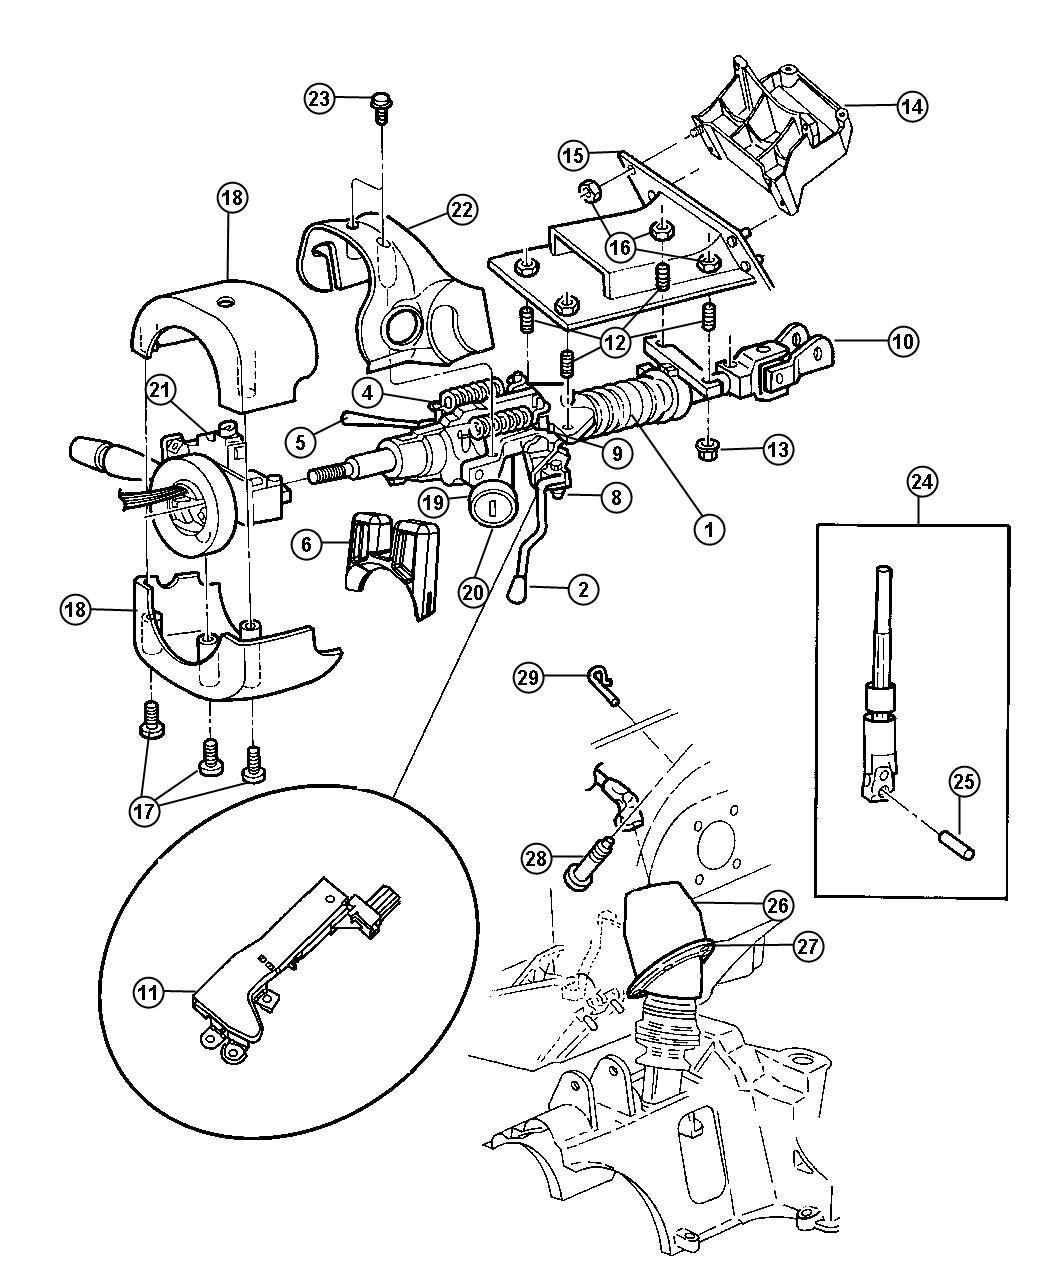 Diagram Corvette Steering Column Diagram Full Version Hd